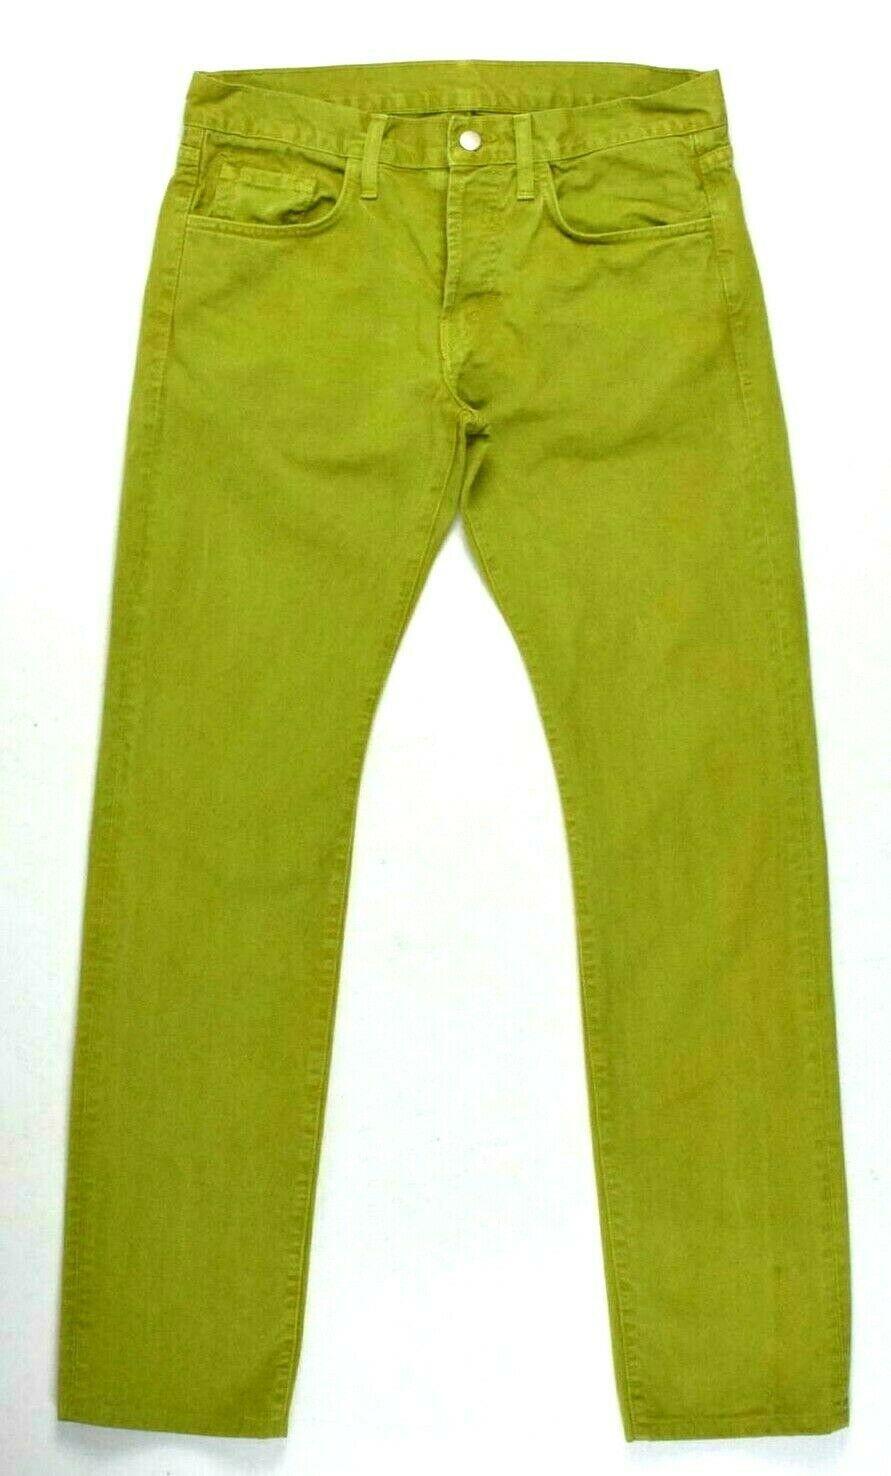 J Brand Green Denim Button Fly Jeans Pants Boot Cut Womens Size 32 x 32.5